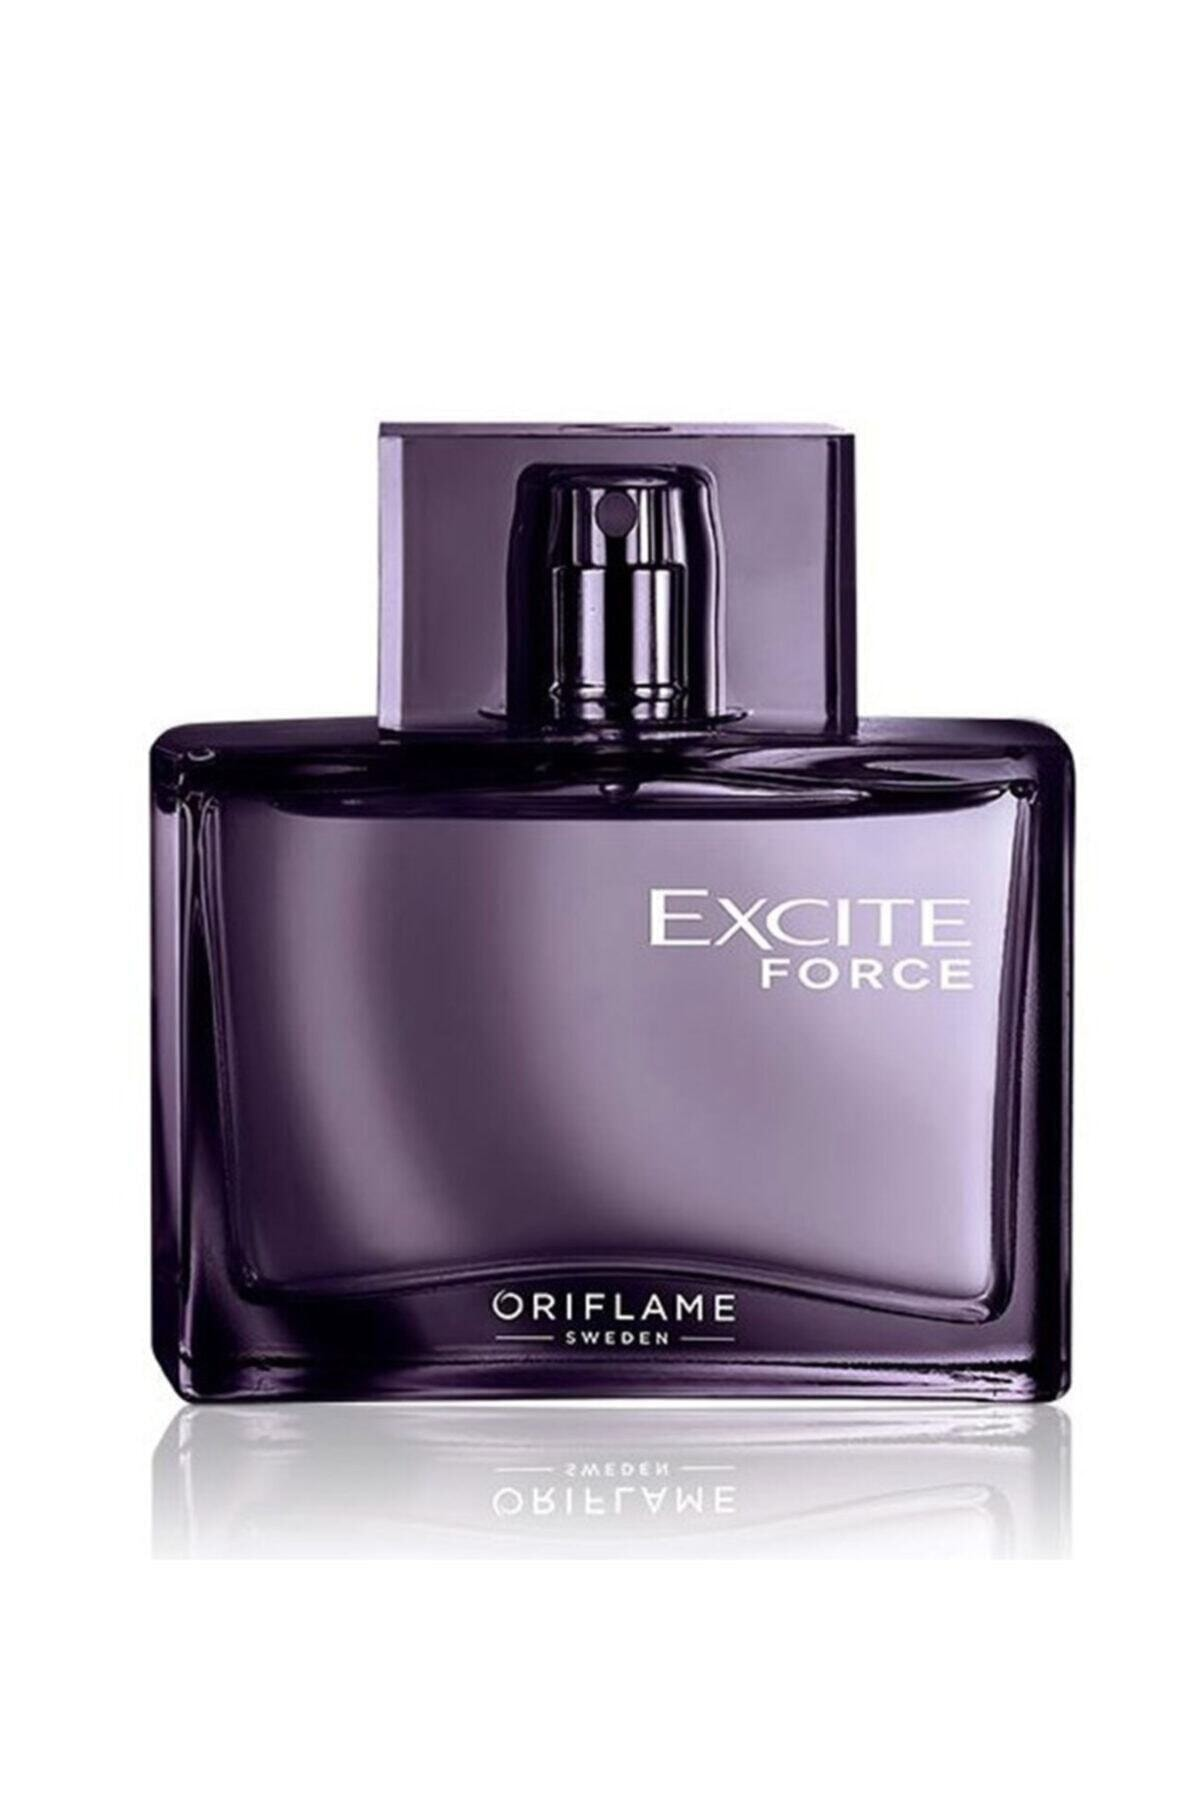 Oriflame Excite Force Edt 75 Ml Erkek Parfümü 1